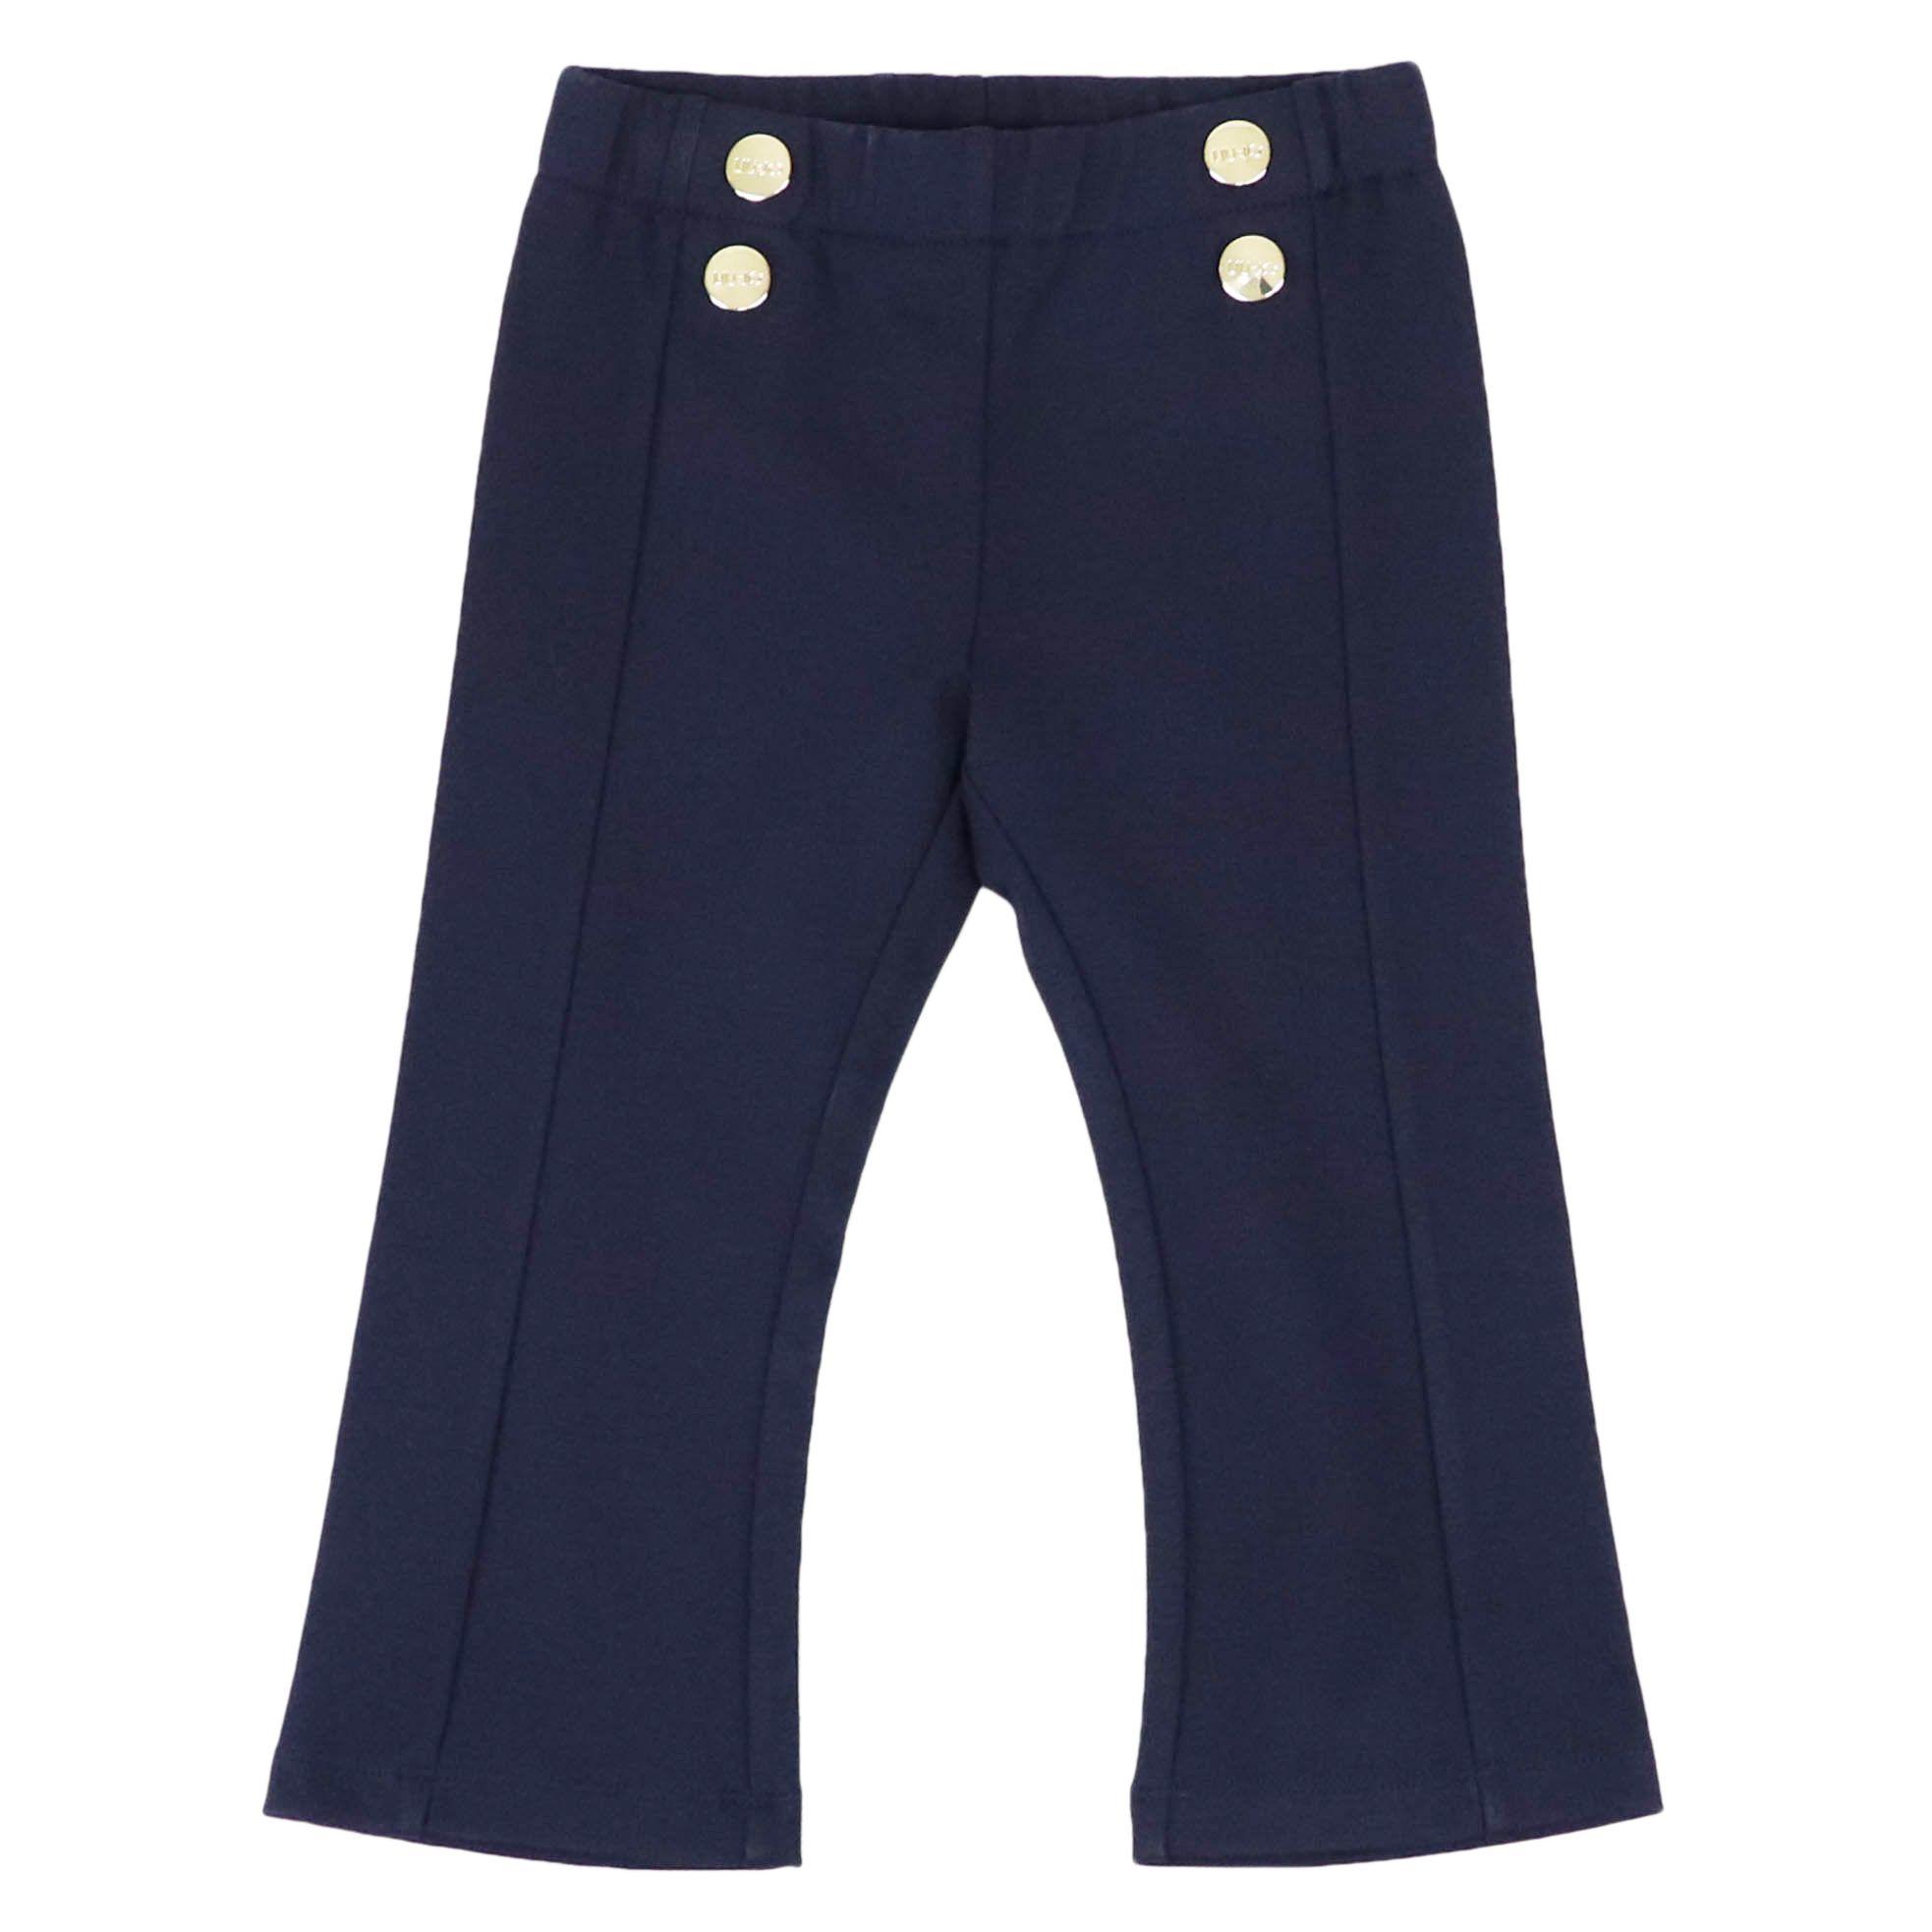 timeless design b5f6e 0f71a Pantalone in jersey punto milano con bottoni metallici